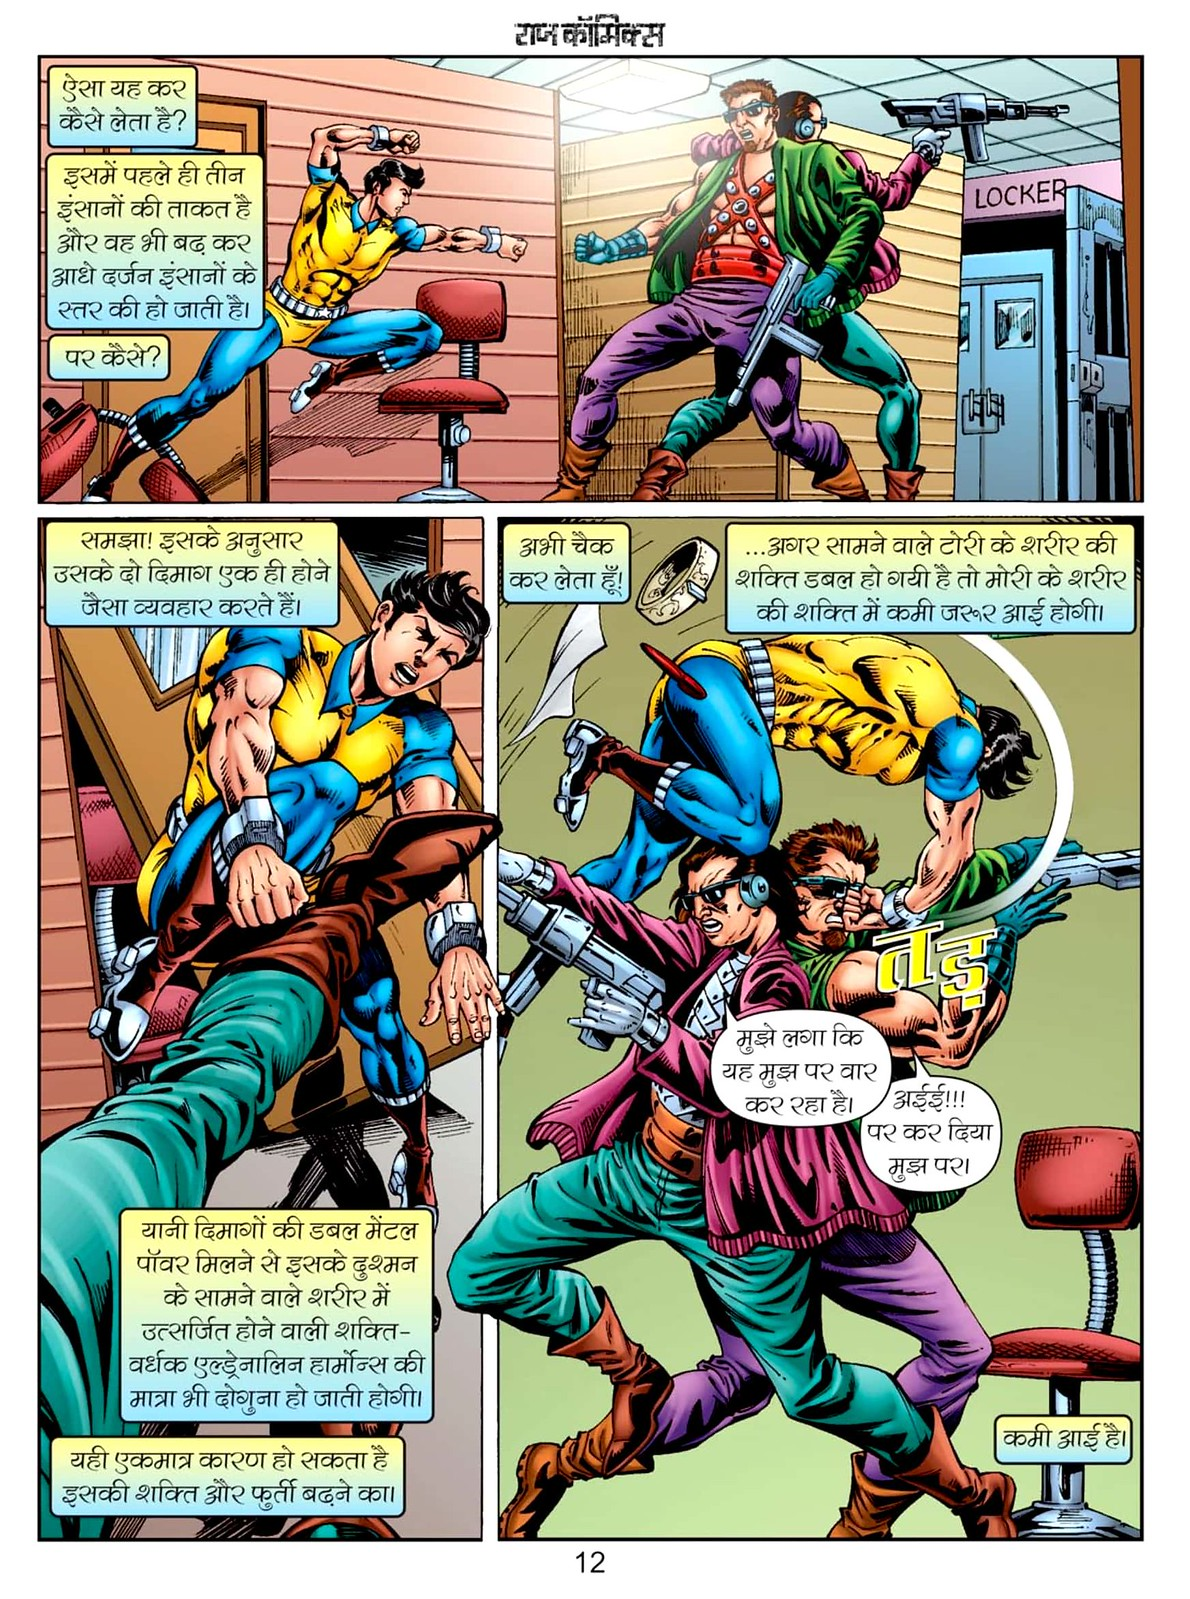 End Game Hindi Comics Free - PrinceFunClub